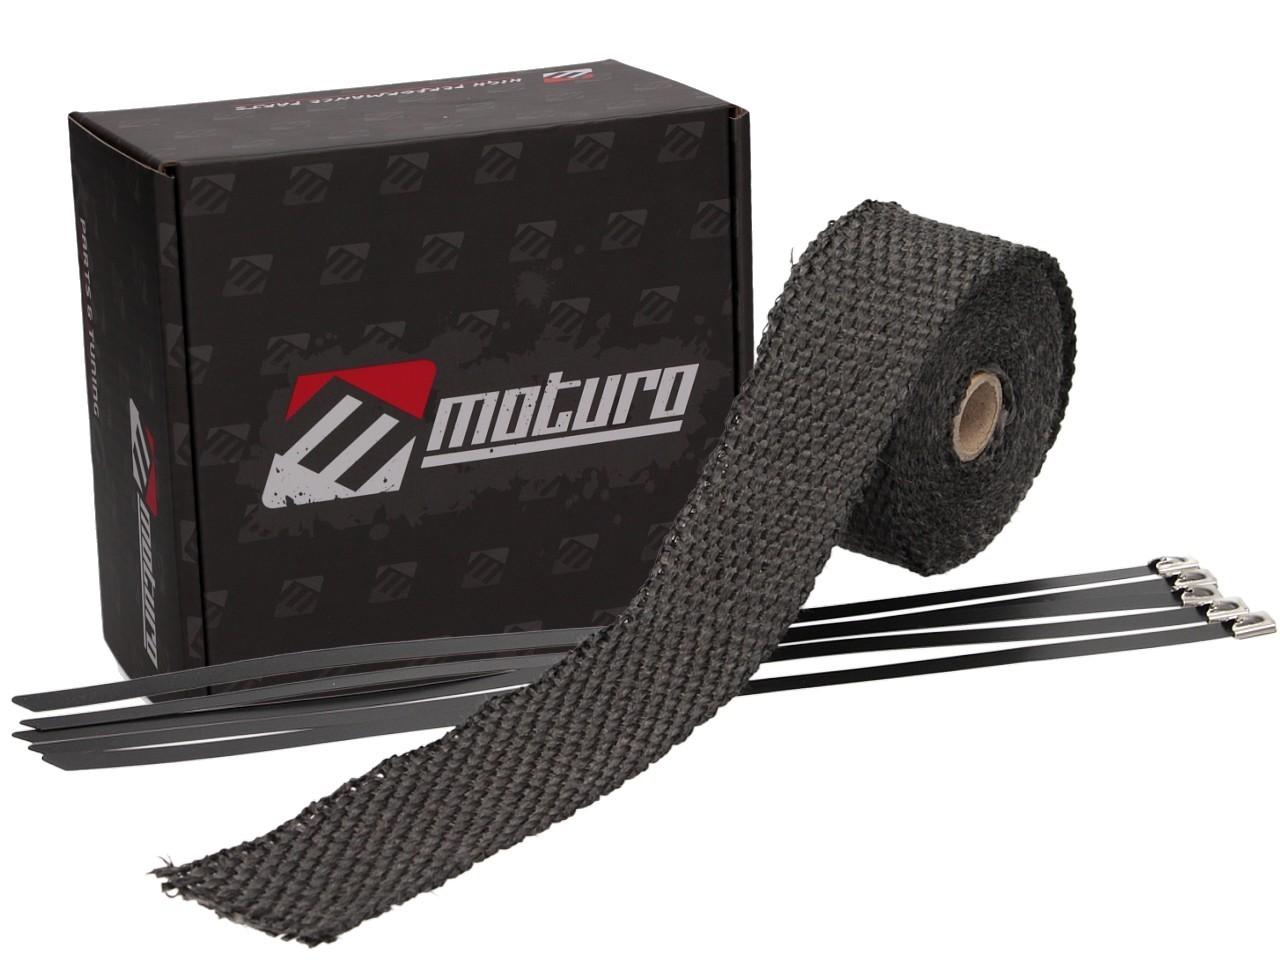 Moturo Hitzeschutzband 5m Ceramic inkl. 5 Metall-Kabelbinder ...